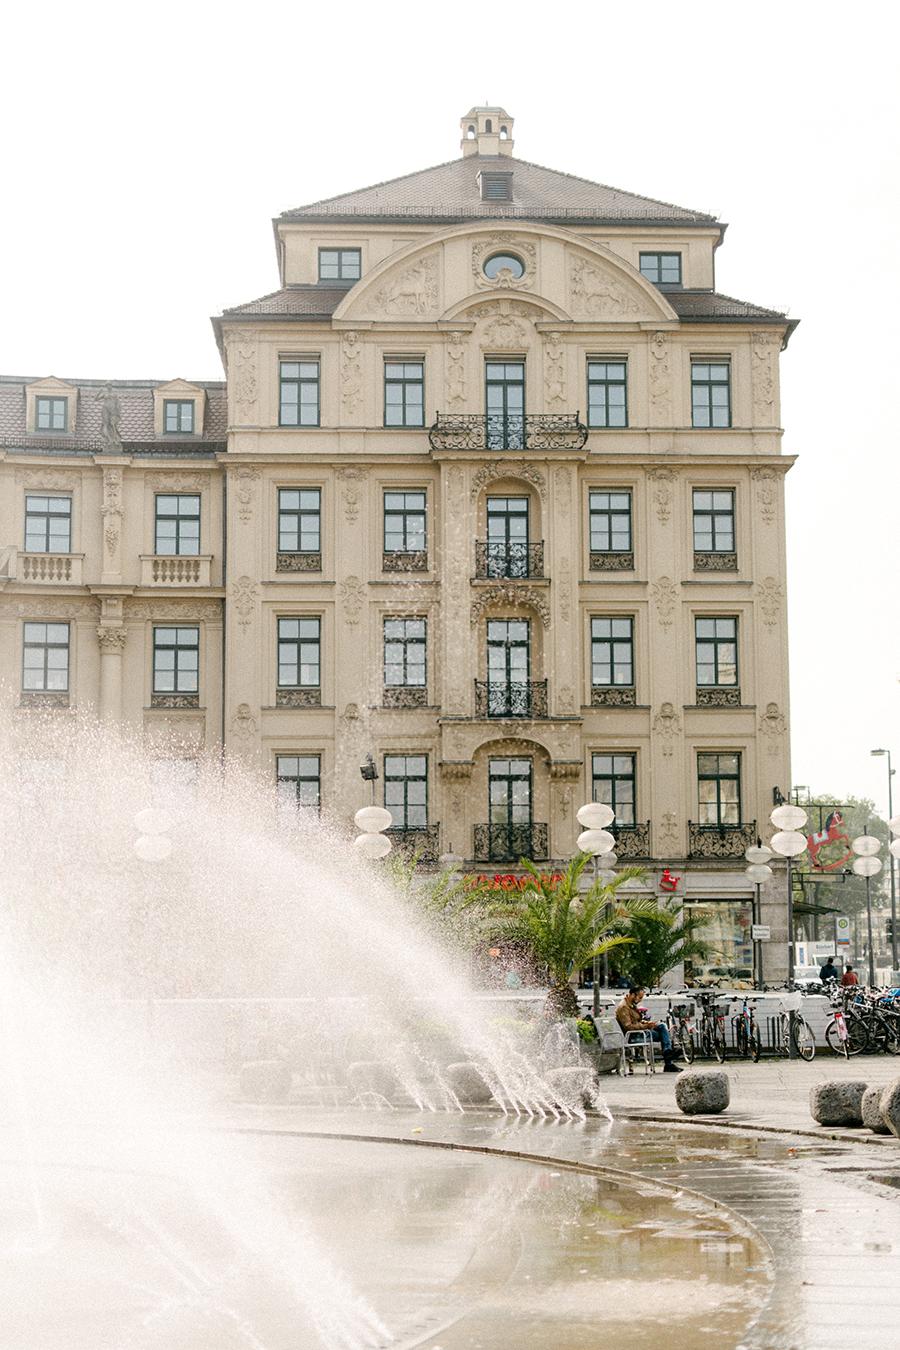 Munich, Munchen, Germany Travel Photography (6).jpg